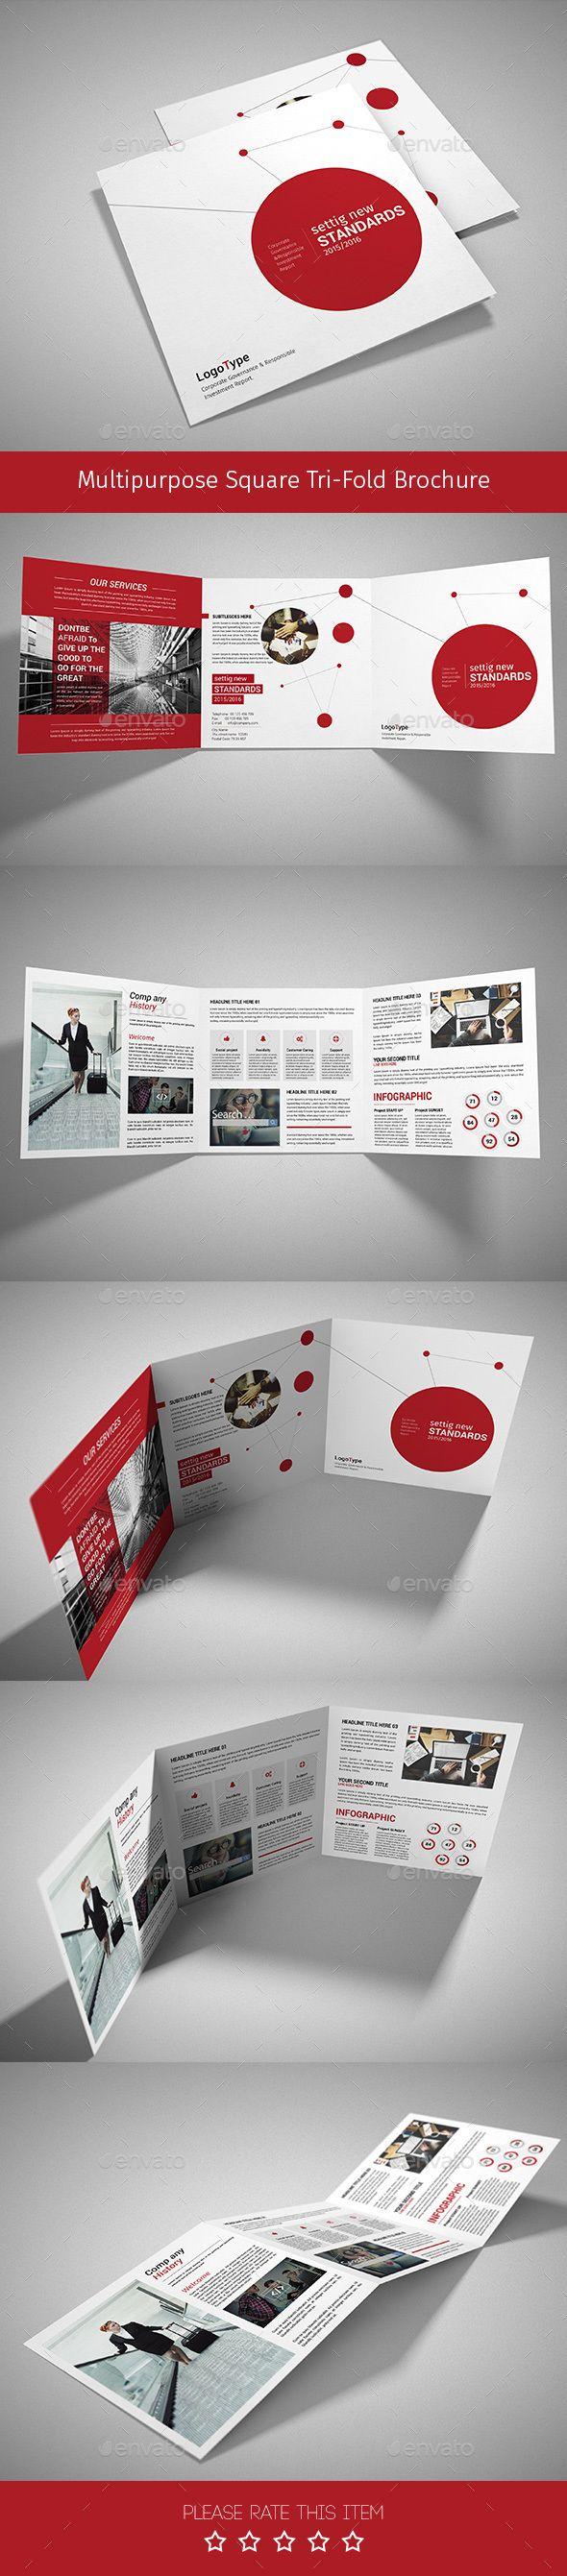 Corporate Tri-fold Square Brochure Template PSD #design Download: http://graphicriver.net/item/corporate-trifold-square-brochure-07/14342890?ref=ksioks